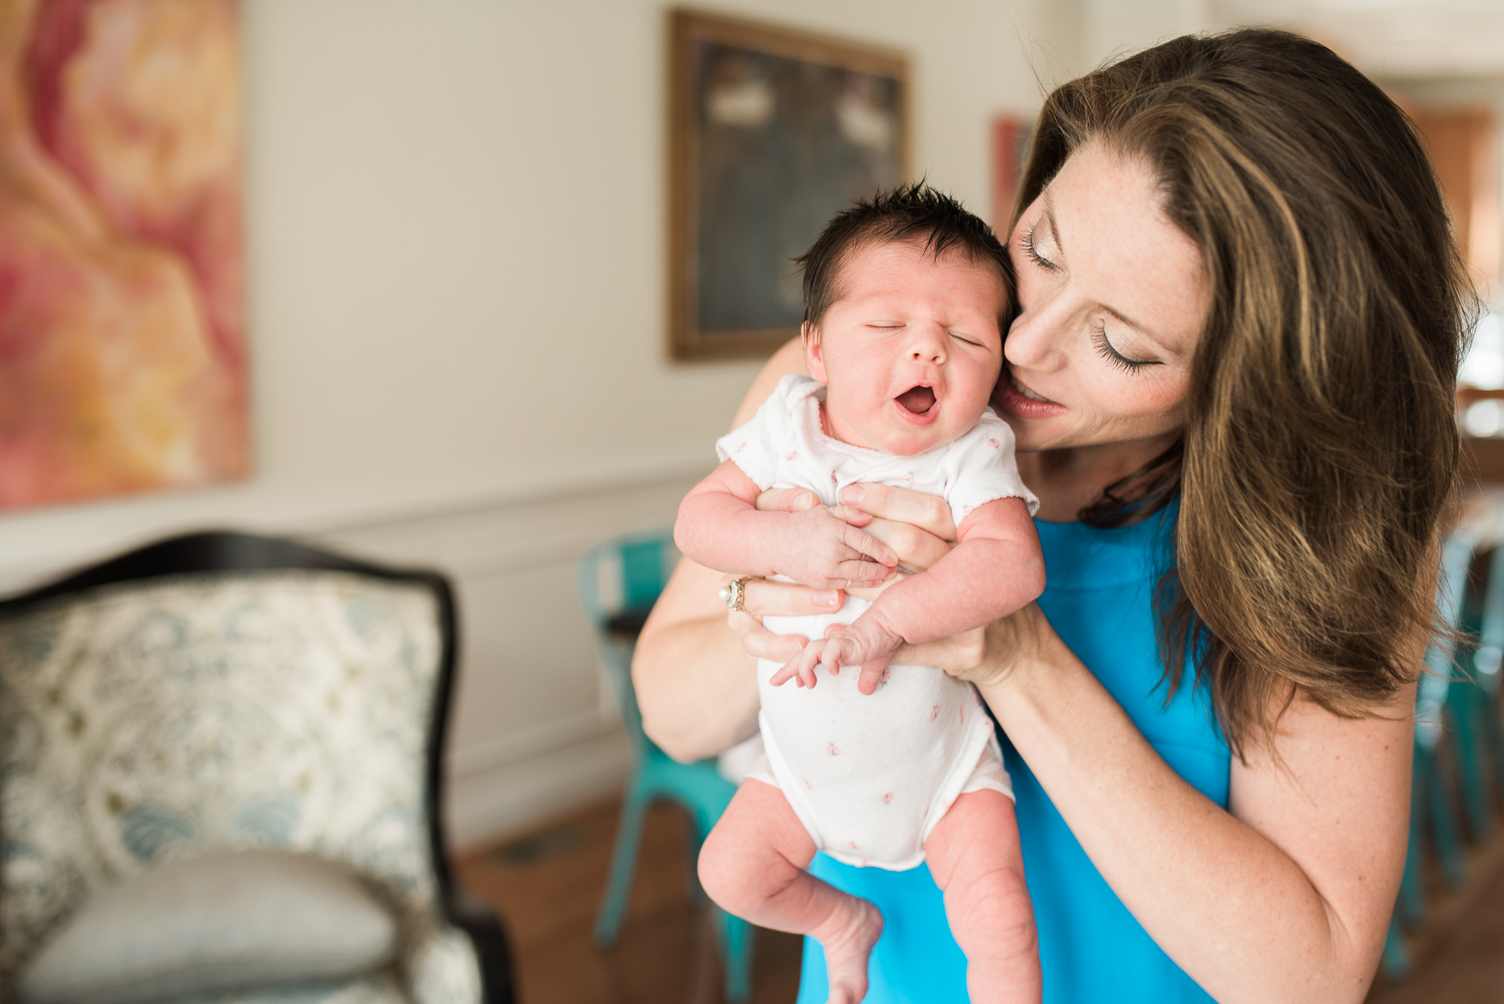 baltimore-harford county-maryland-newborn-lifestyle-photographer-breanna-kuhlmann-50.jpg